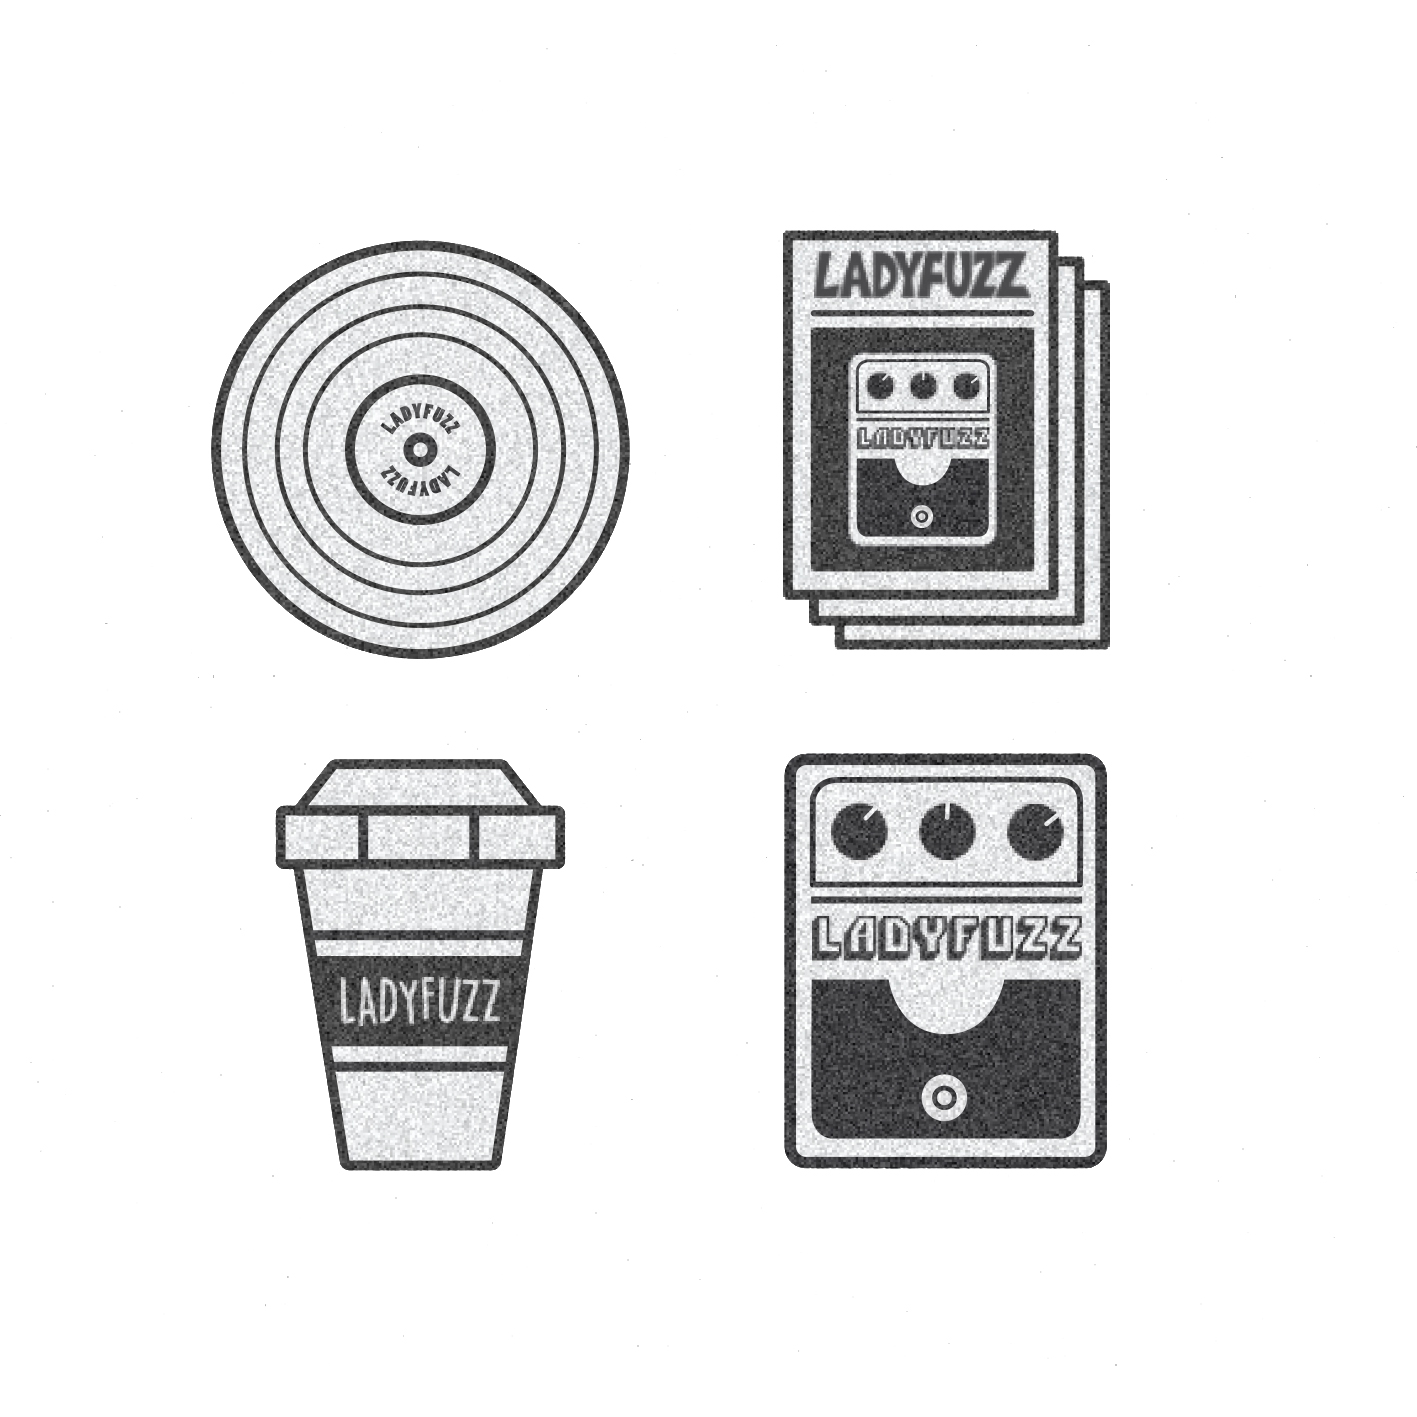 Ladyfuzz Sticker Set